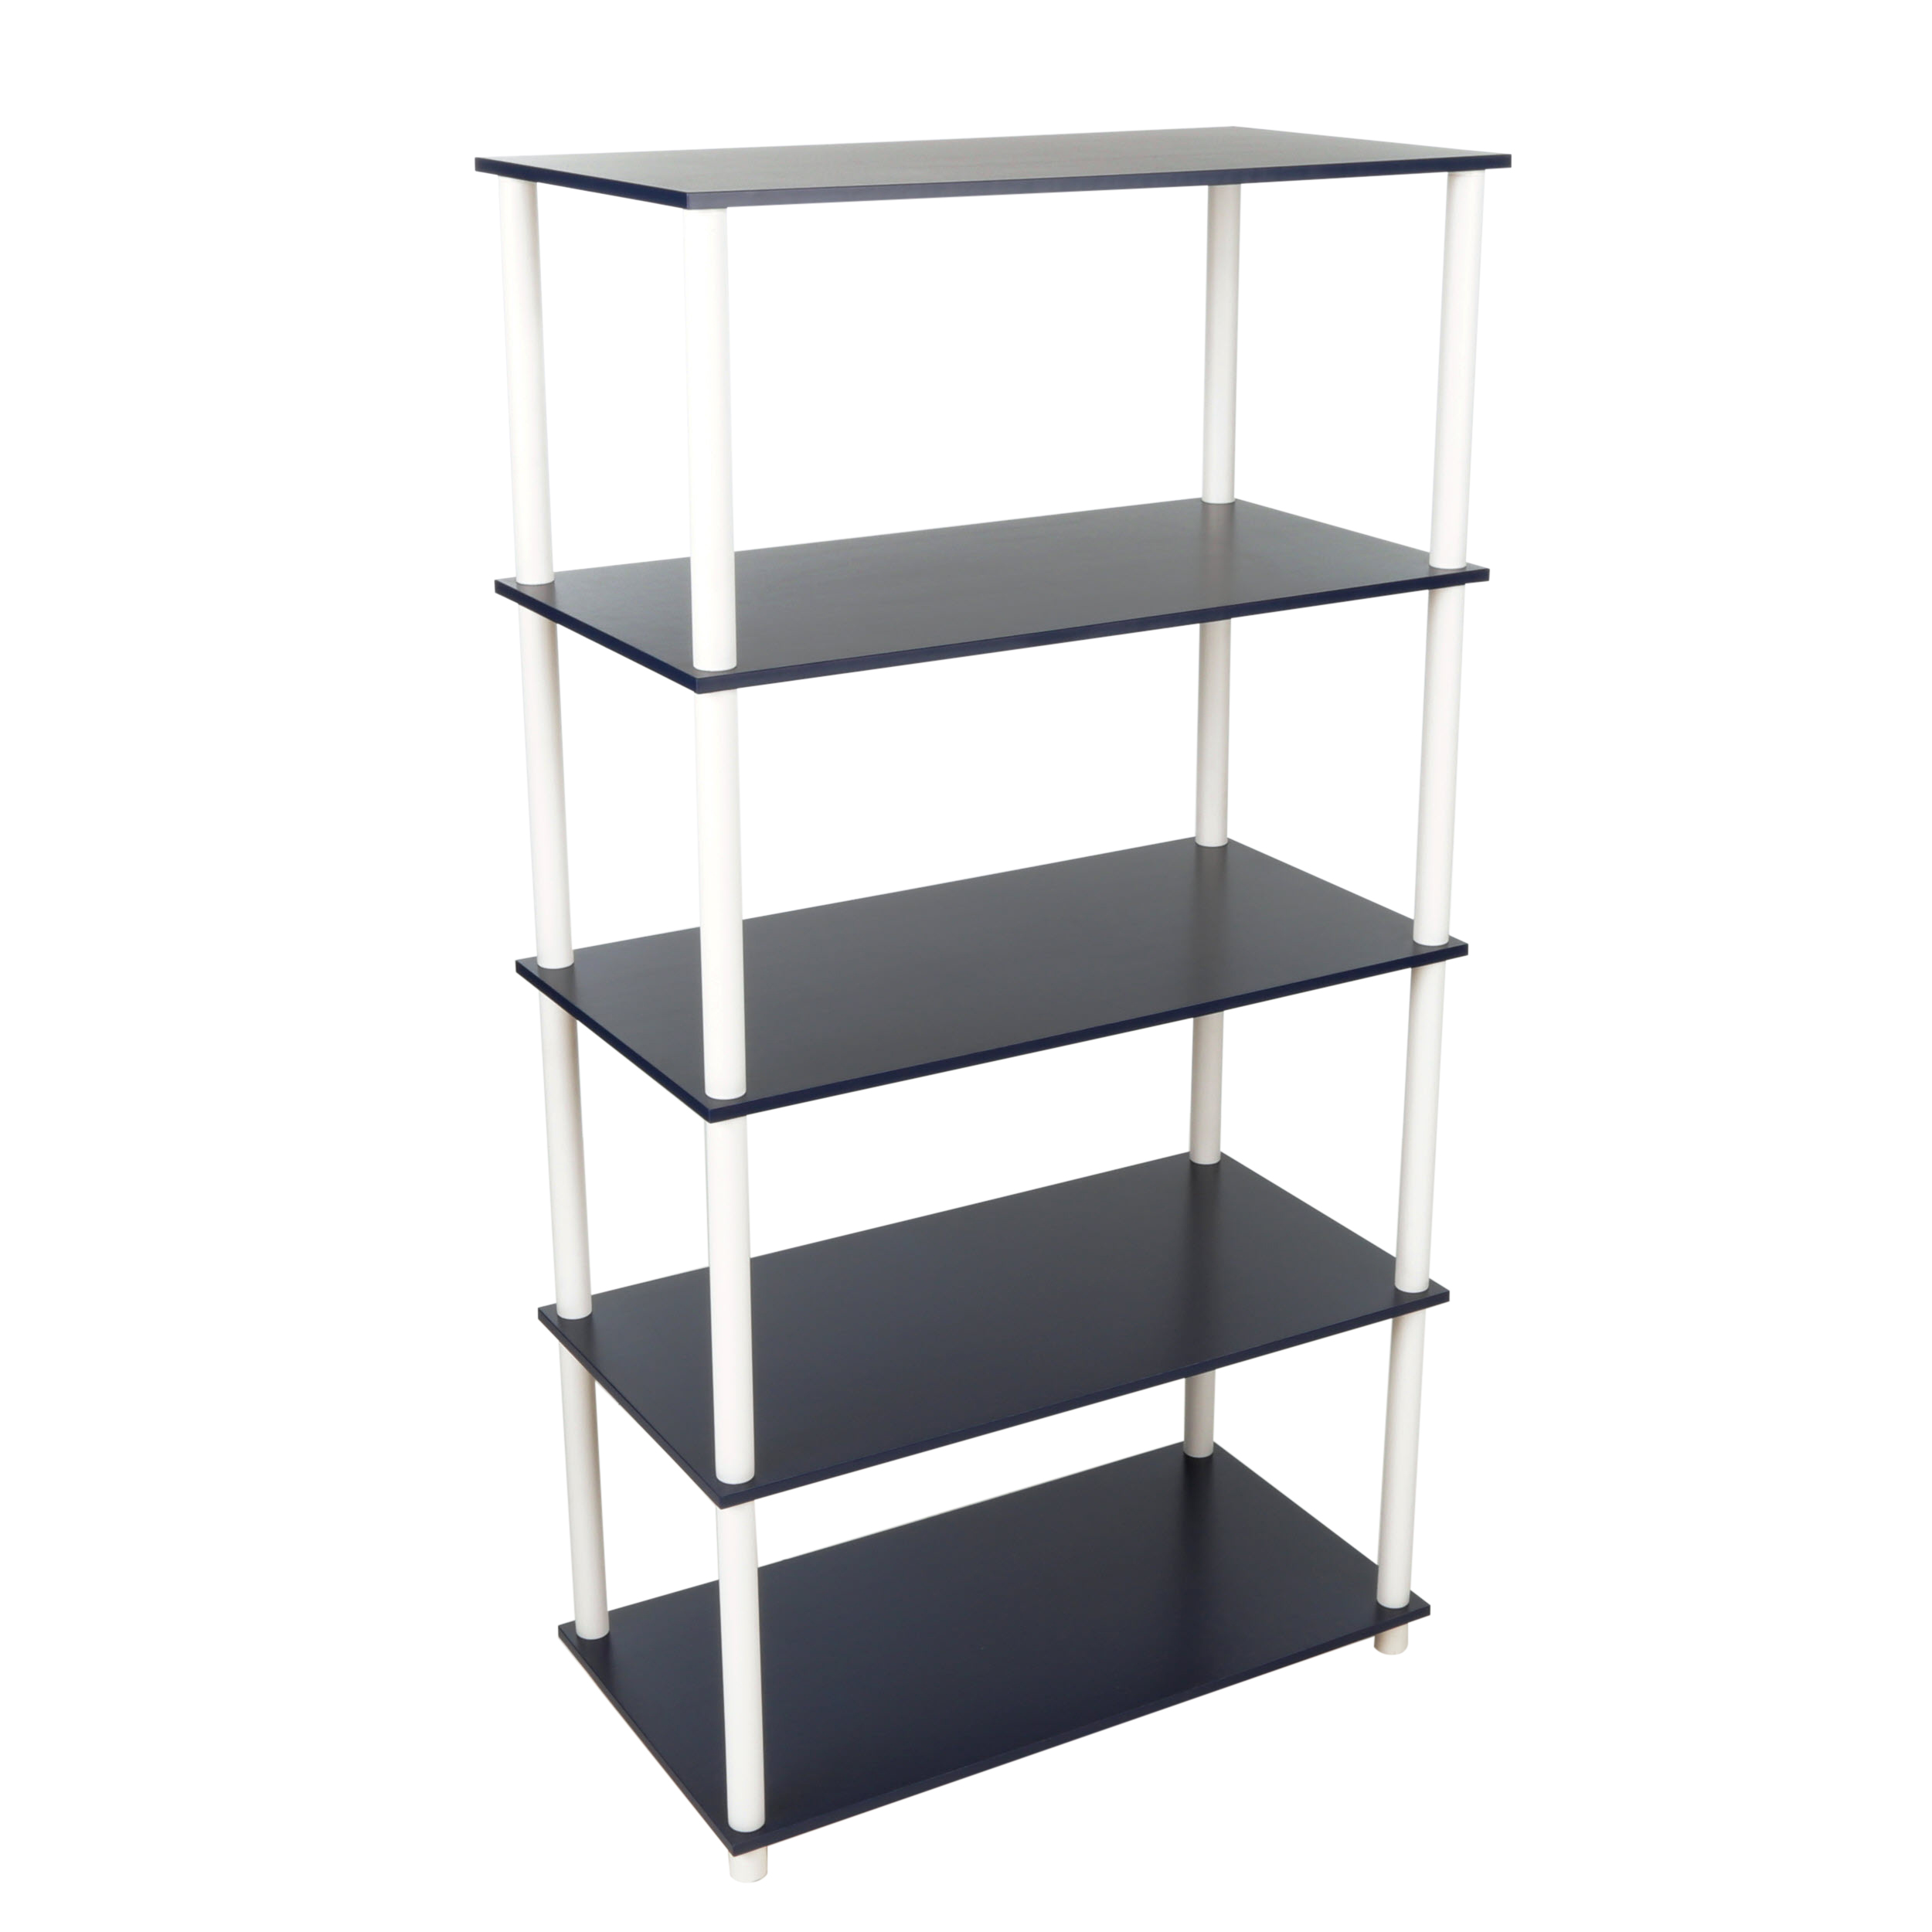 Mainstays No Tools Assembly 8 Cube Shelving Storage Unit